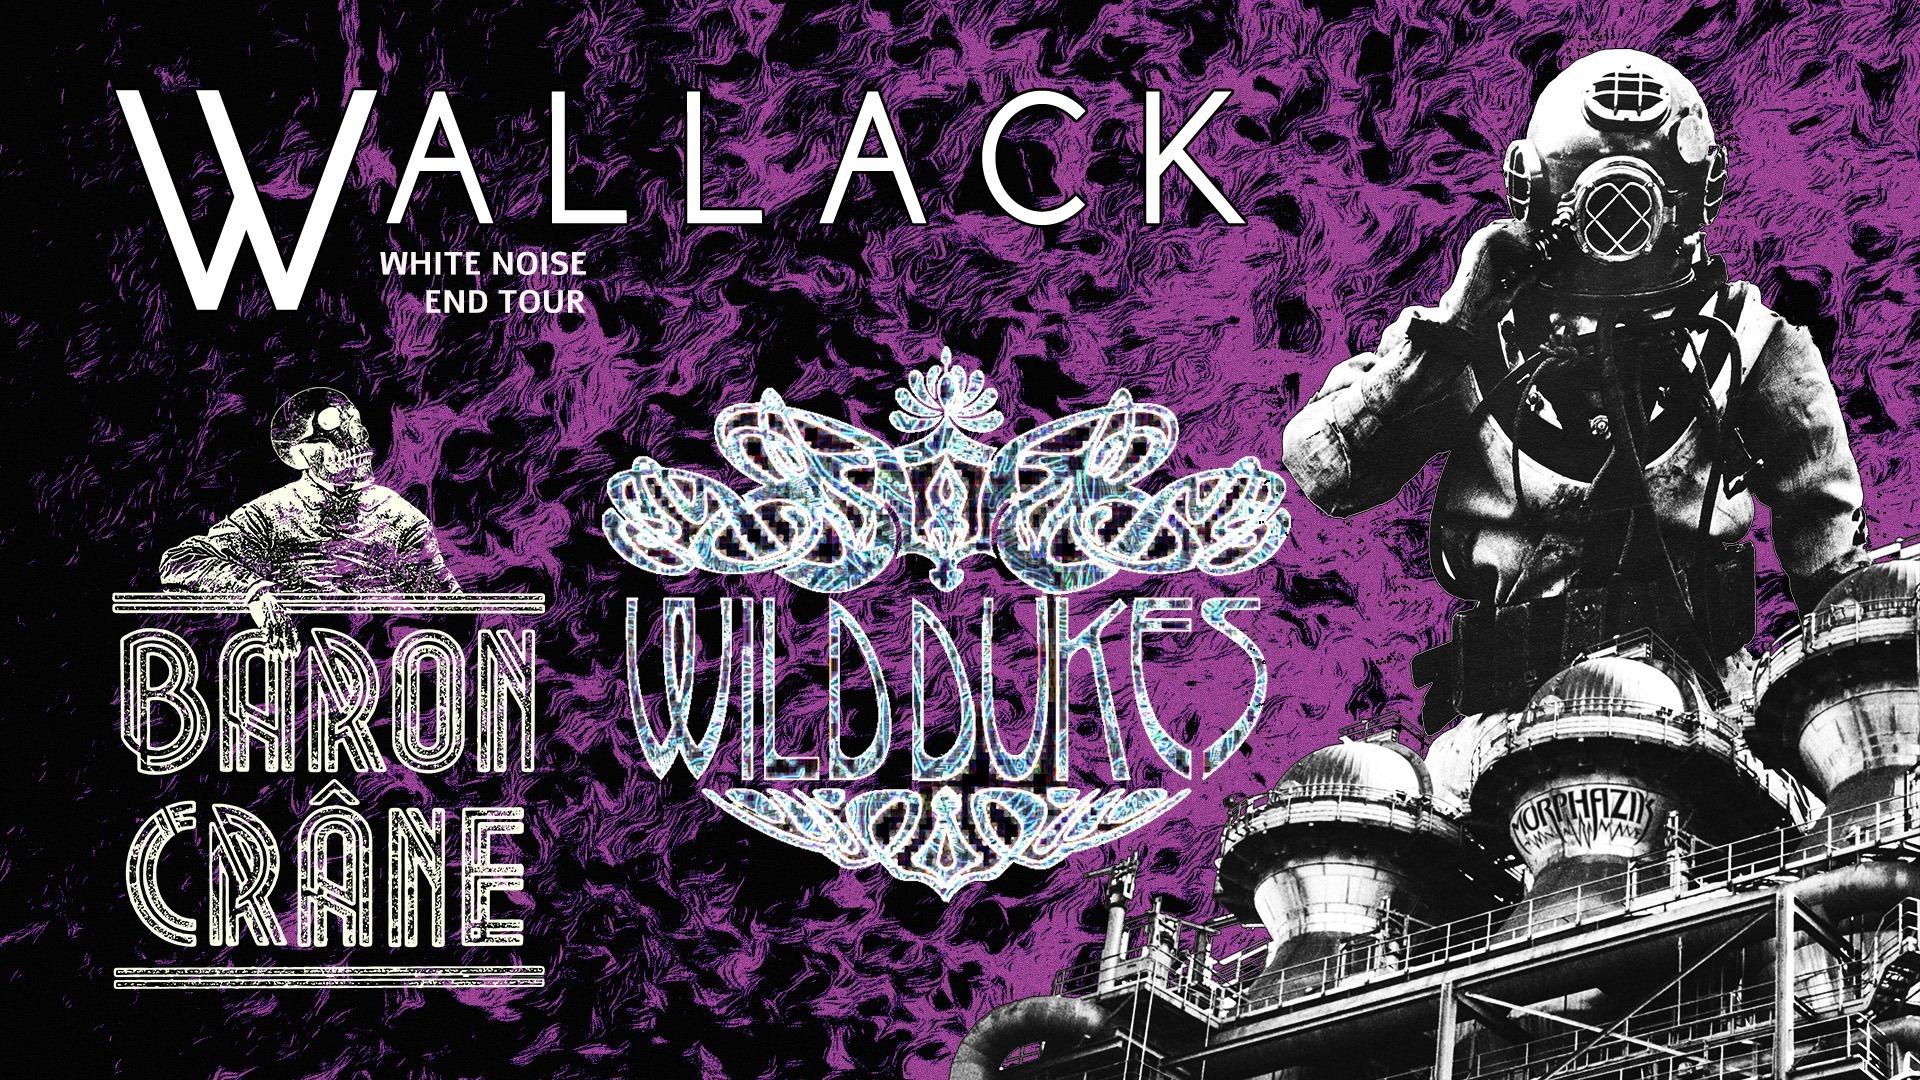 Wallack + Baron Crâne + The Wild Dukes